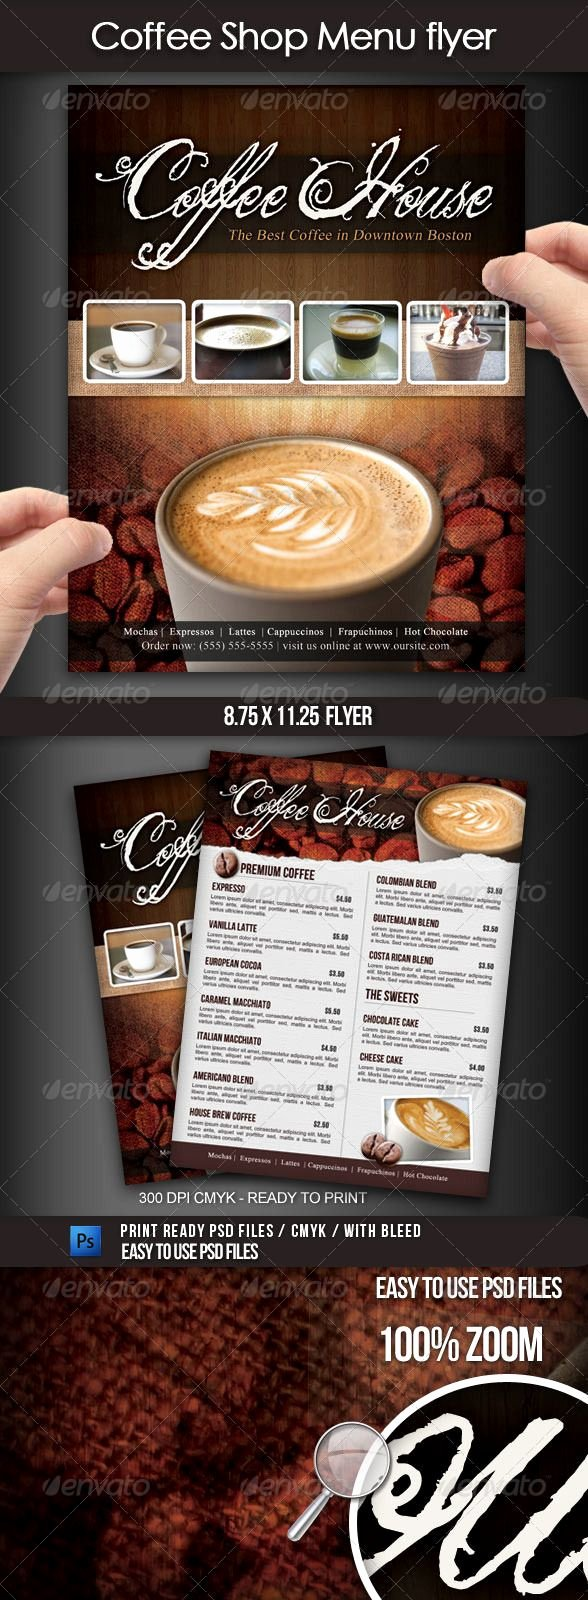 Coffee Shop Menu Template Beautiful Coffee Shop Menu Flyer